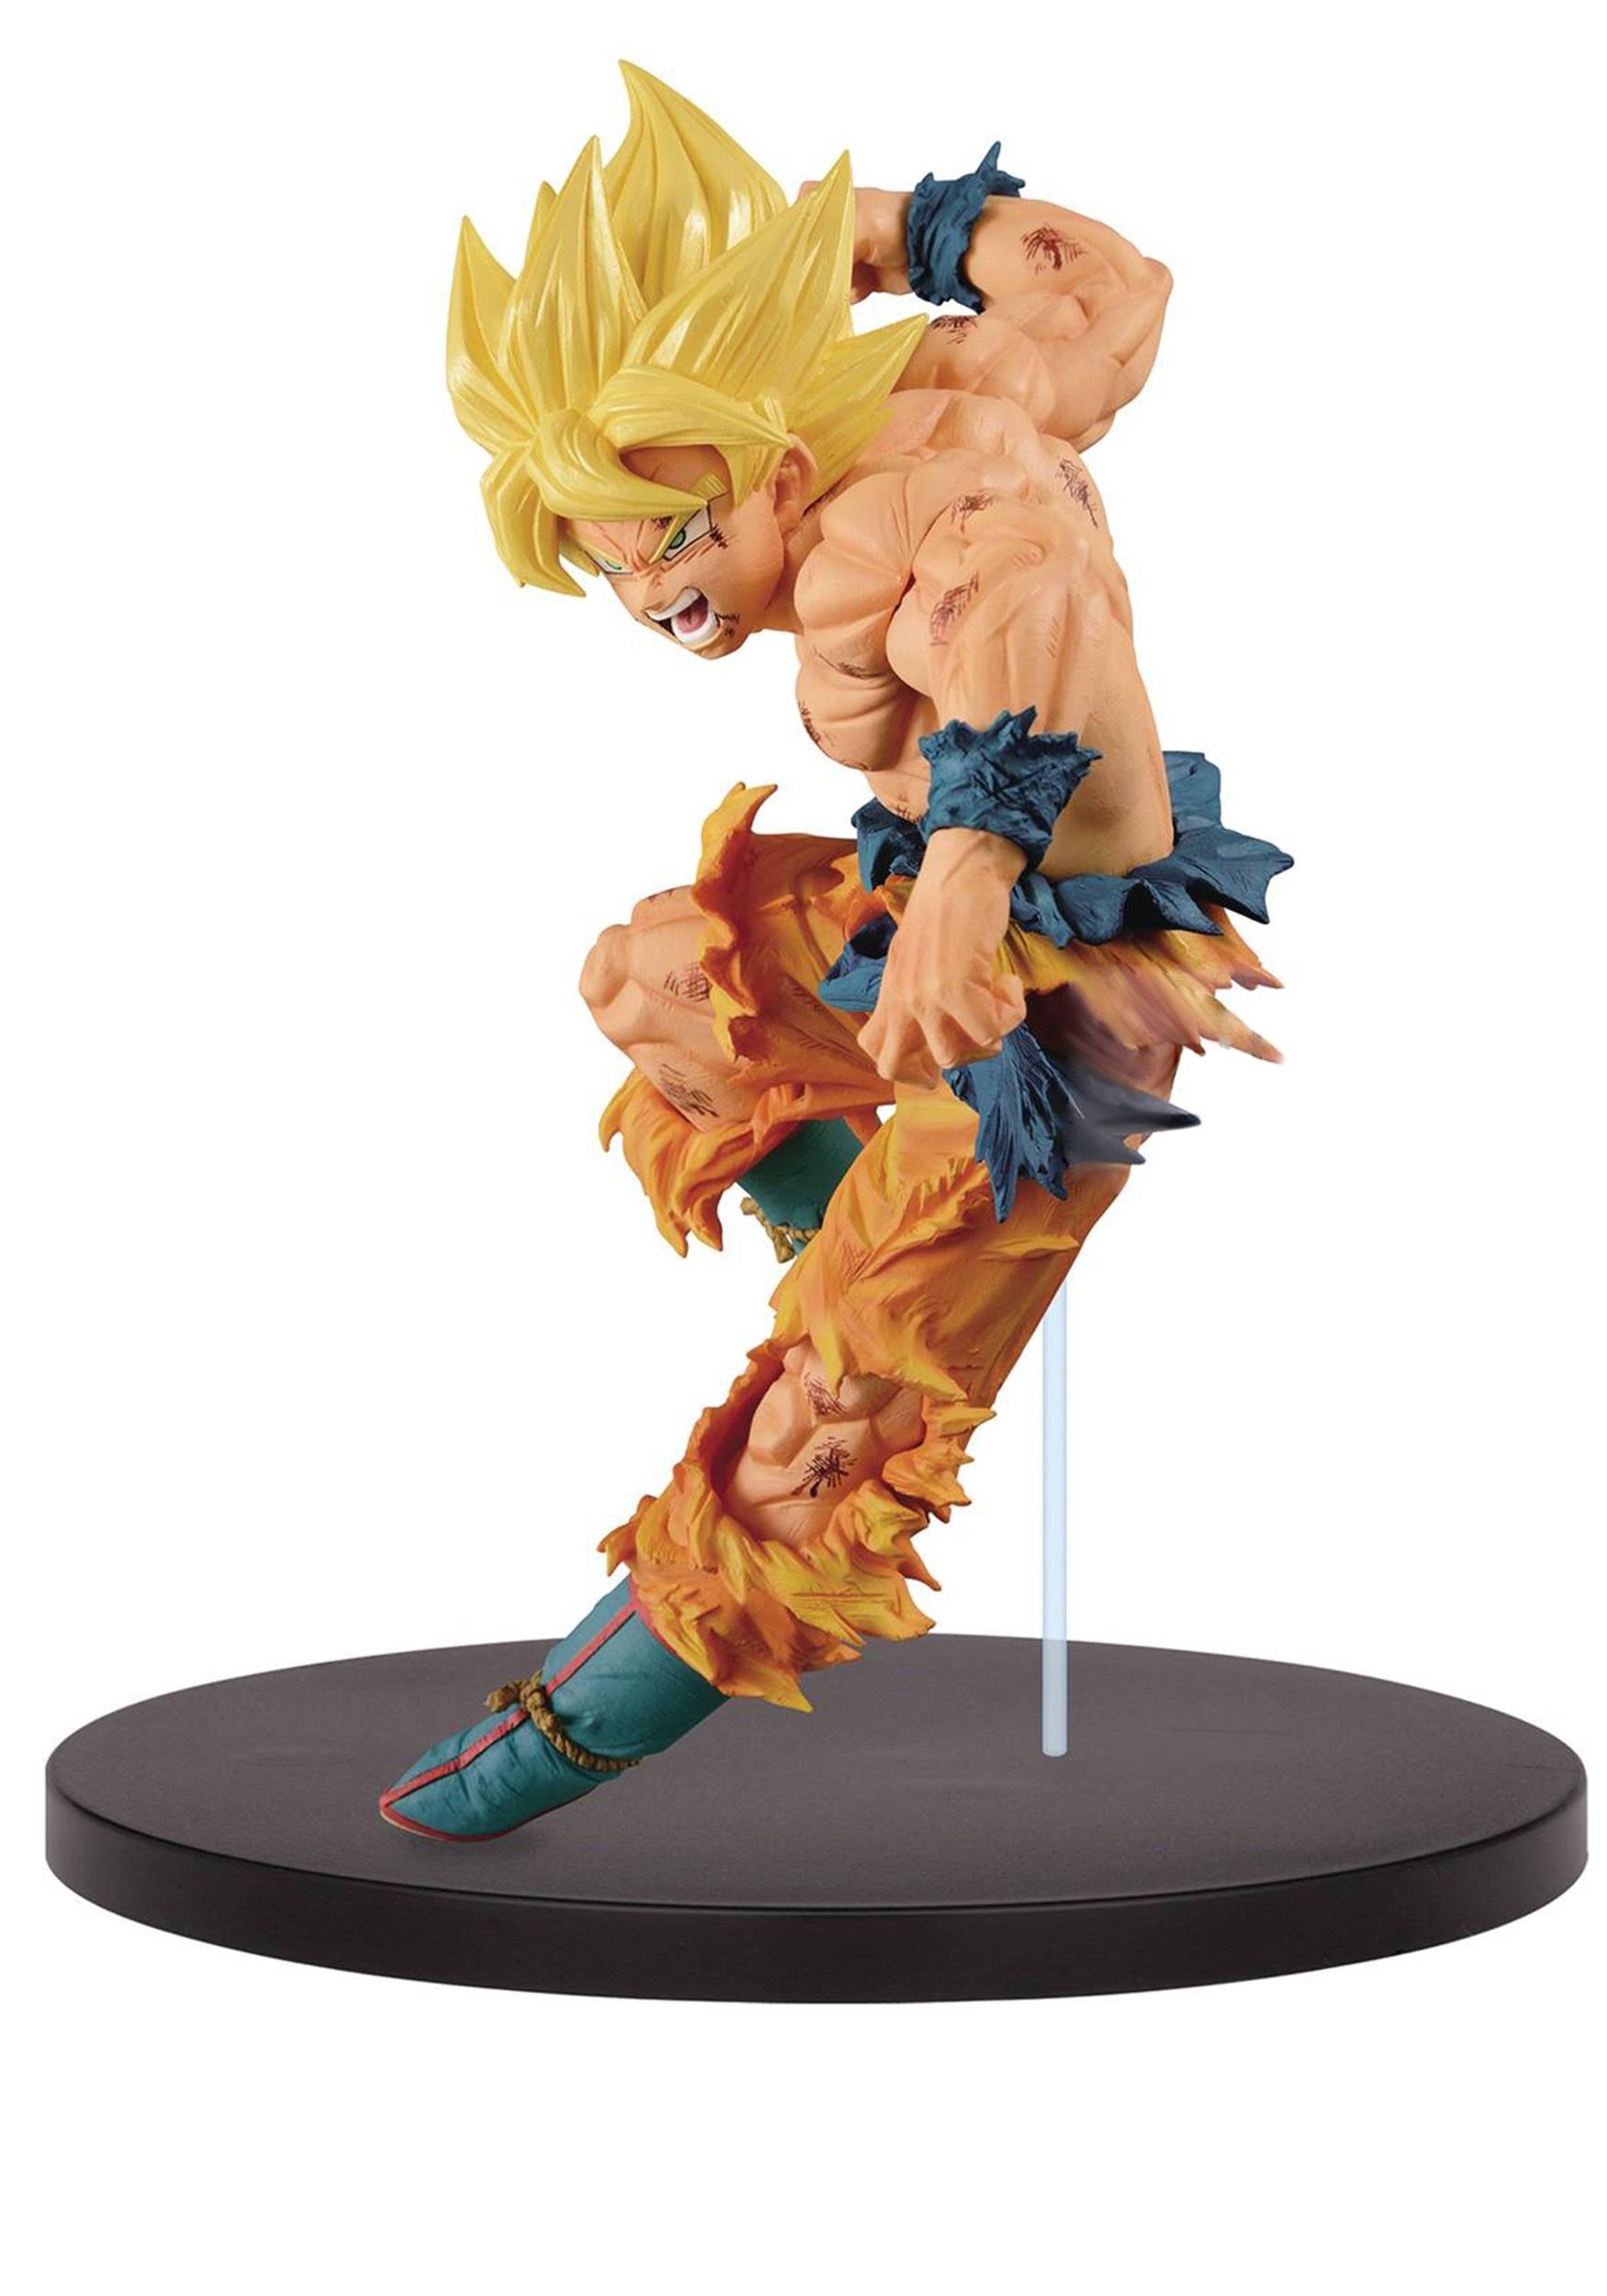 Dragon Ball Z Match Makers Super Saiyan Son Goku Figure1 d3304dfc9849